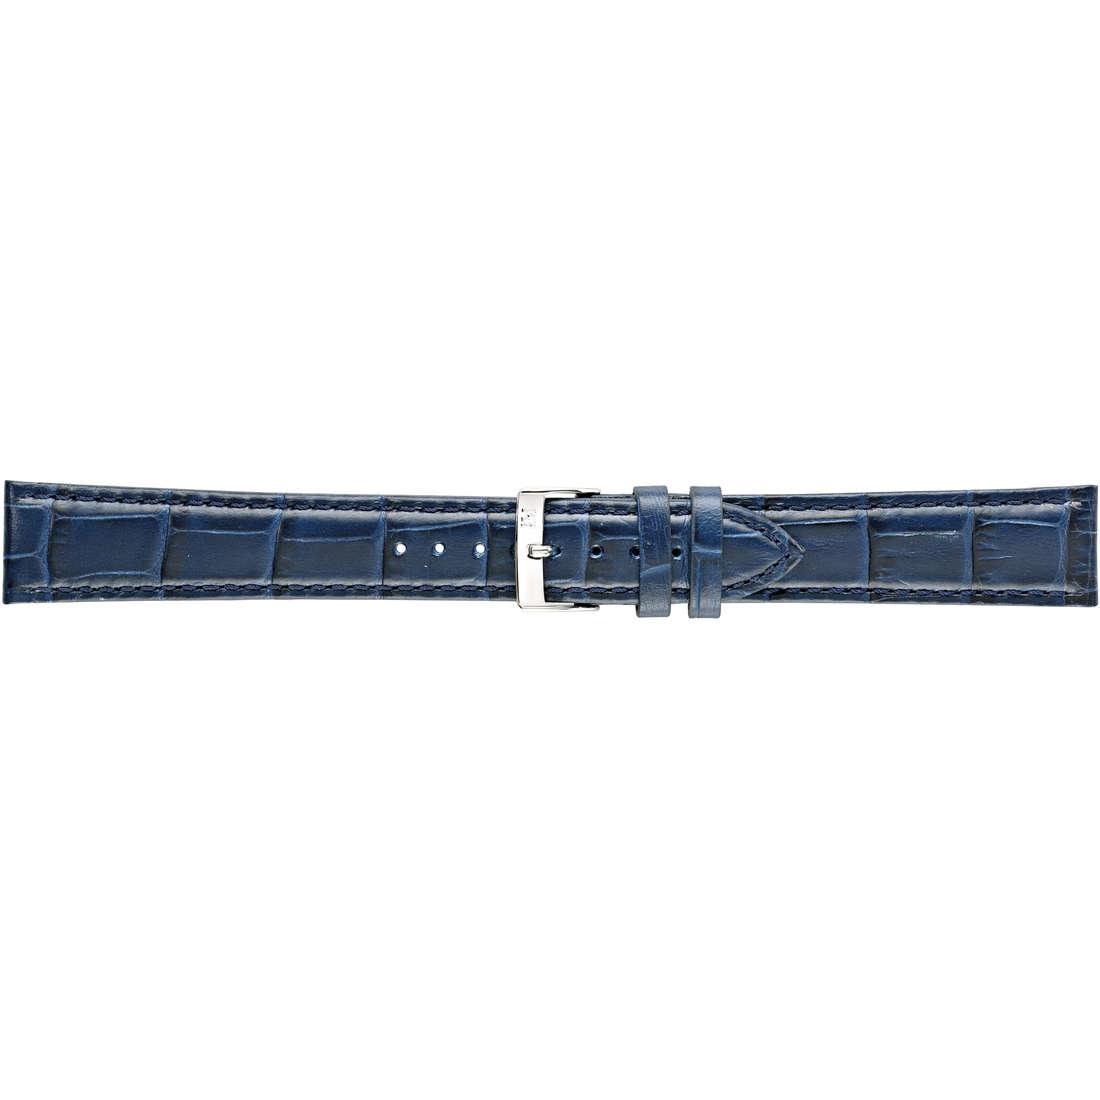 montre bande de montres unisex Morellato I Lunghi A01Y2269480061CR20